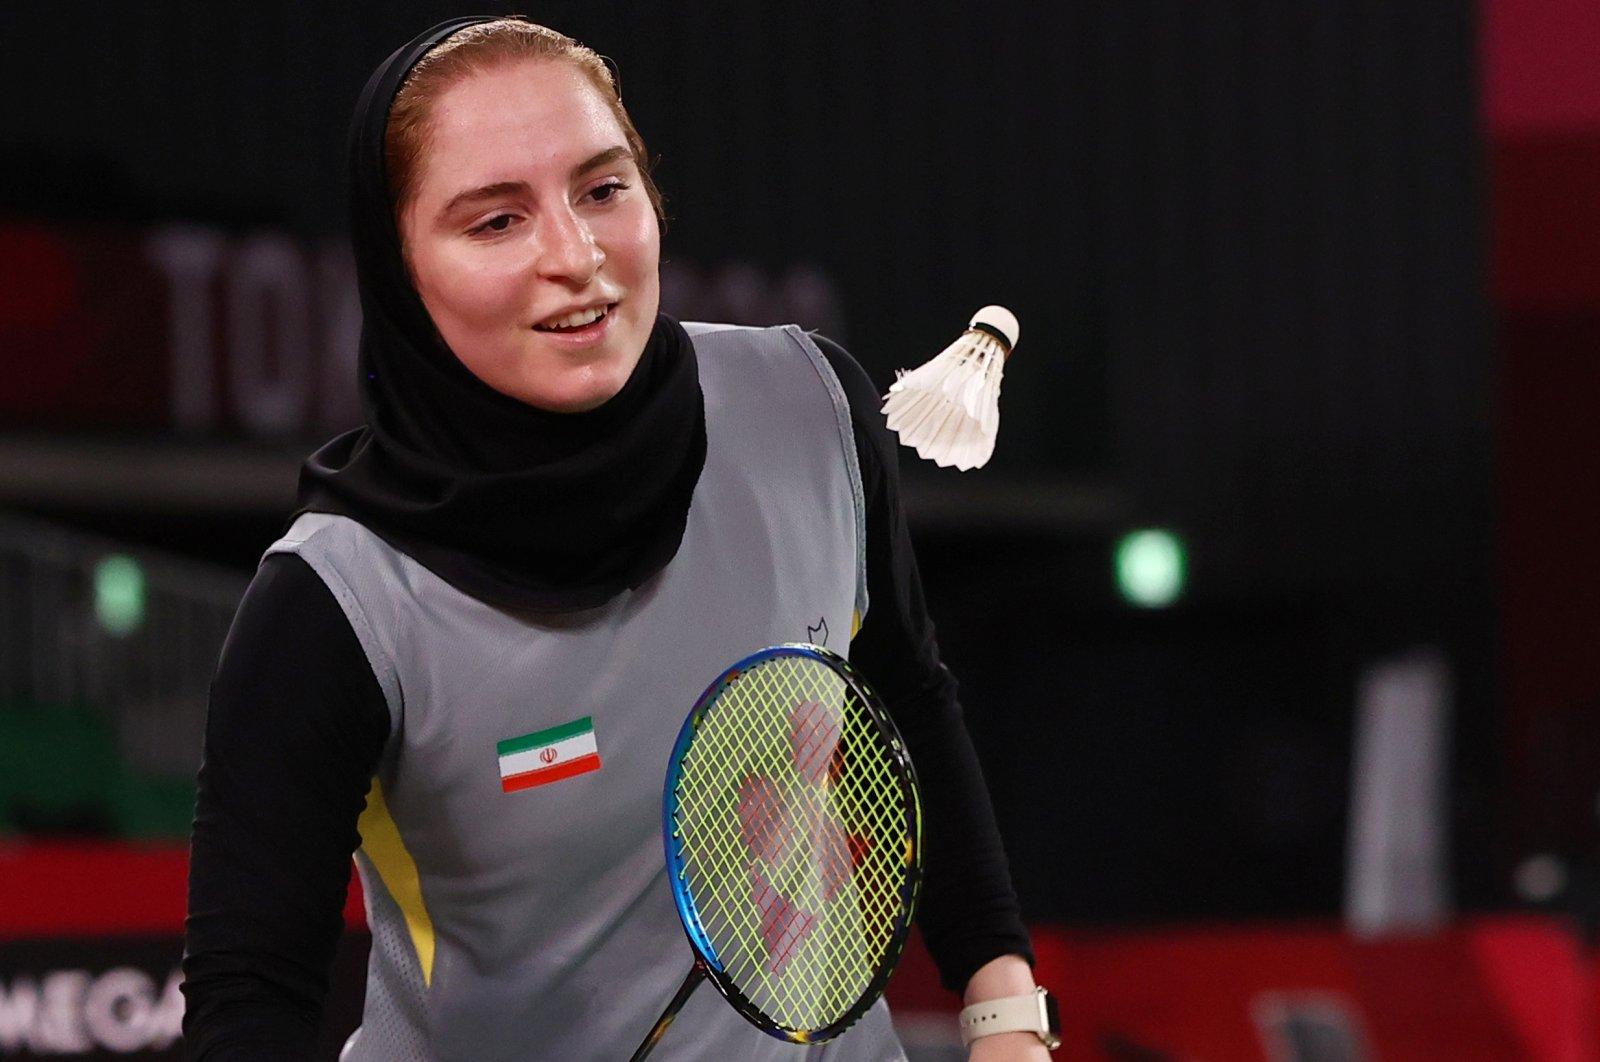 Iran's Soraya Aghaeihajiagha in action against China's He Bingjiao in Tokyo 2020 Olympics badminton women's singles match, Tokyo, Japan, July 28, 2021.